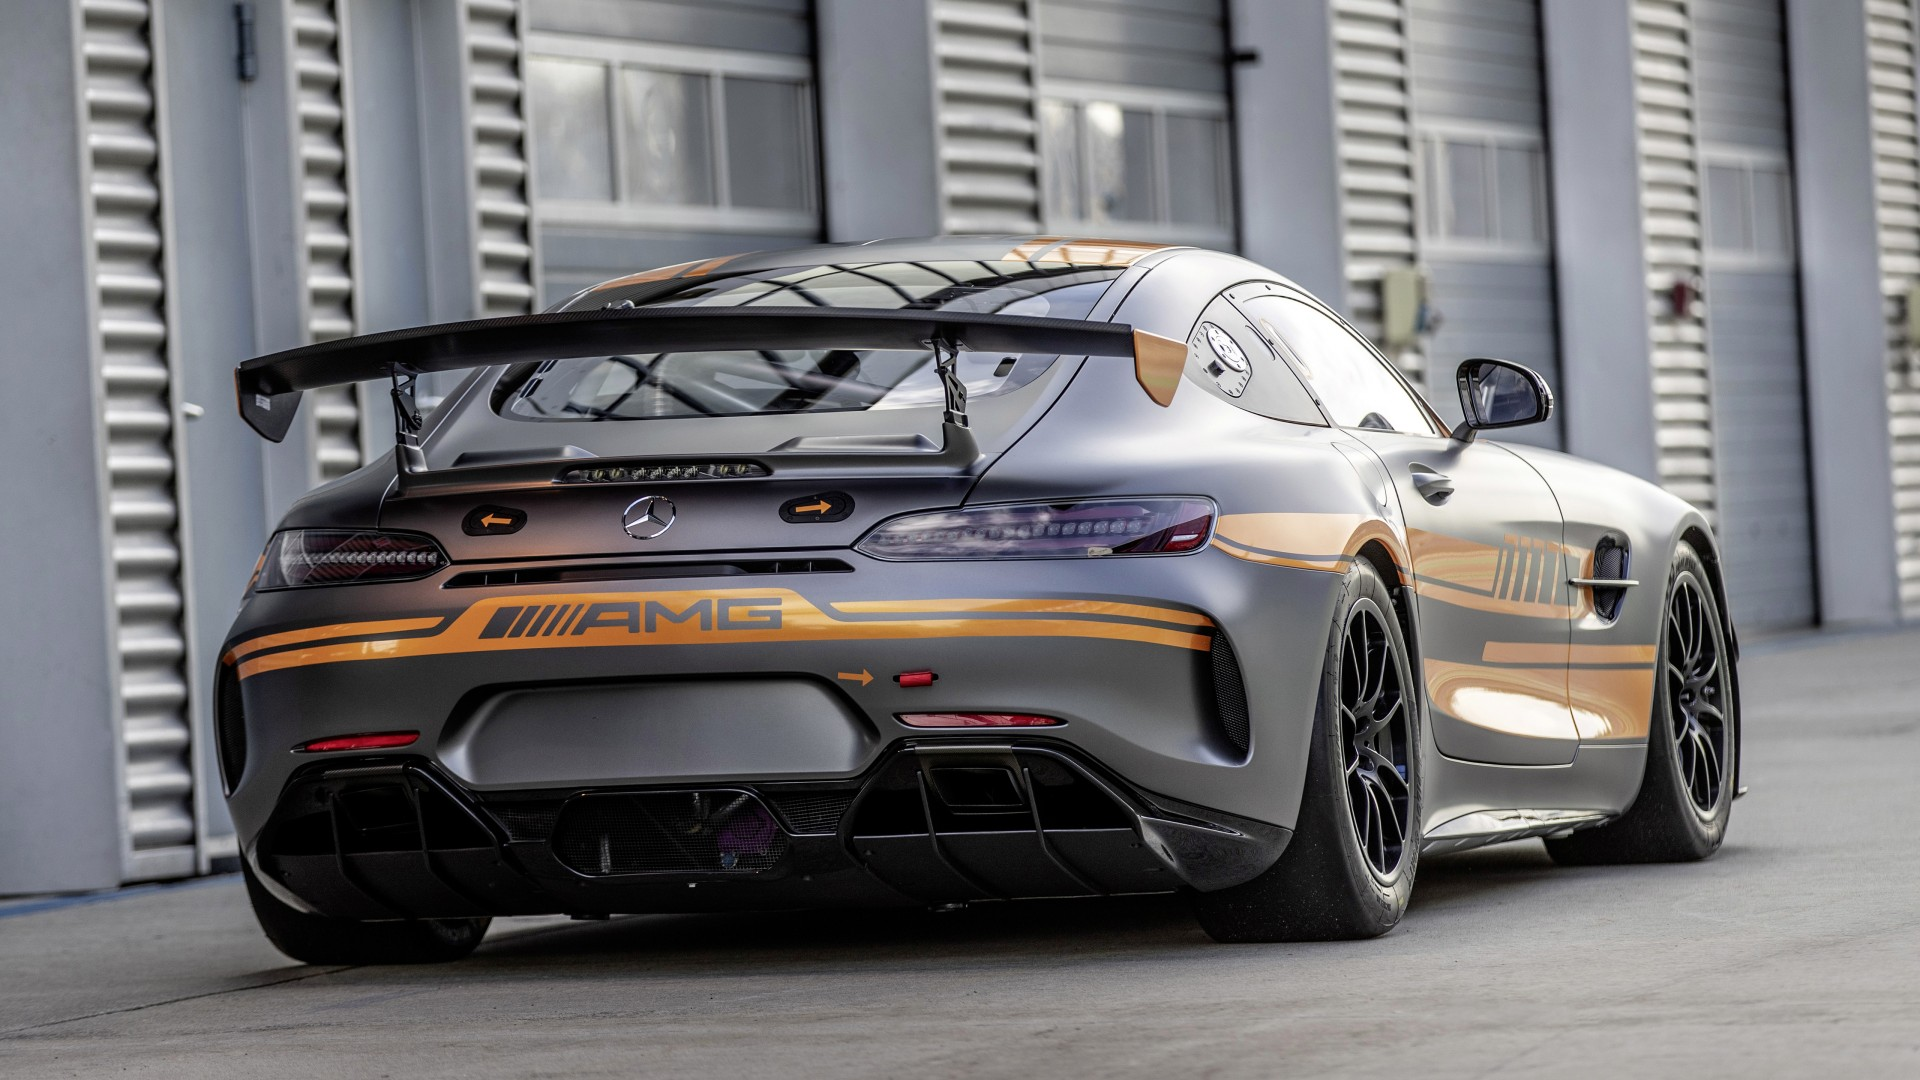 Mercedes-AMG GT4 2020 5K Wallpaper   HD Car Wallpapers ...